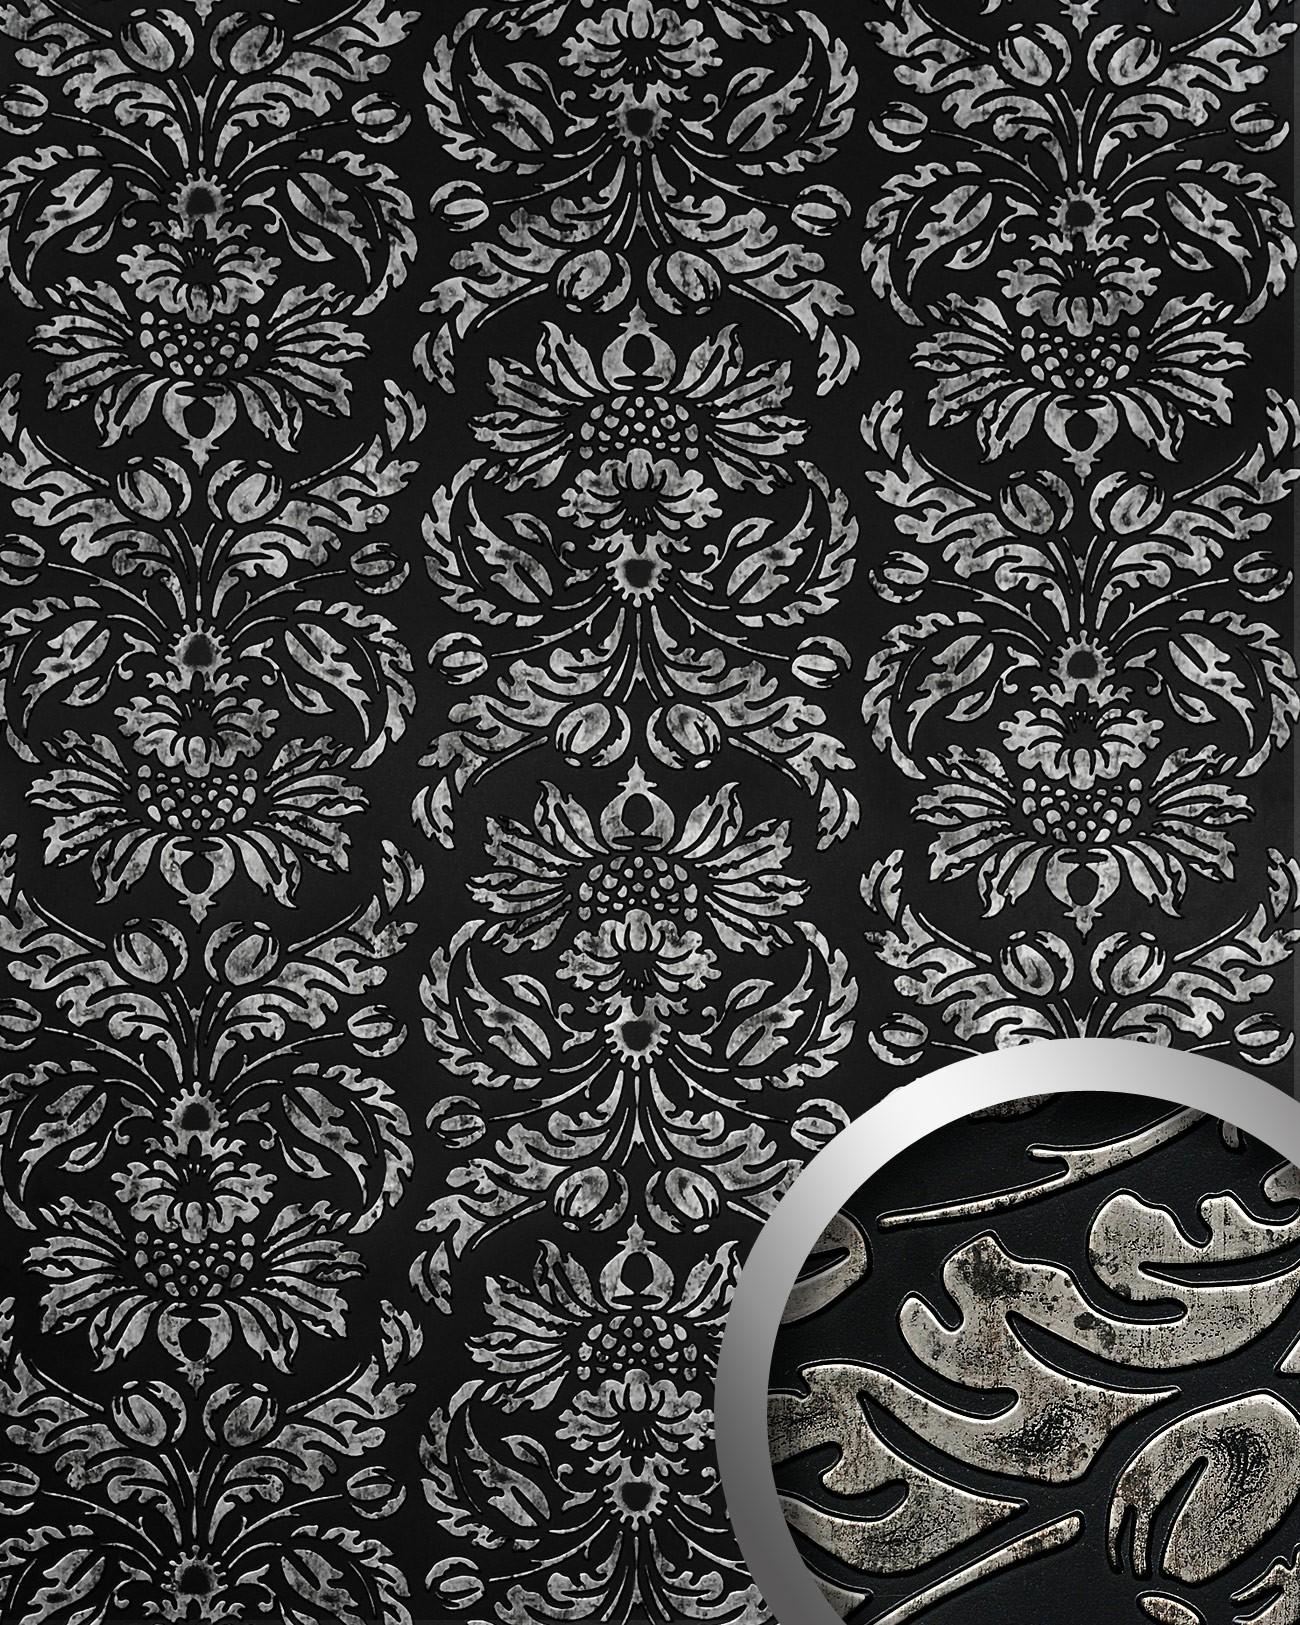 wandpaneel vintage barock wallface 14800 imperial damask selbstklebende tapete deko wandbelag. Black Bedroom Furniture Sets. Home Design Ideas